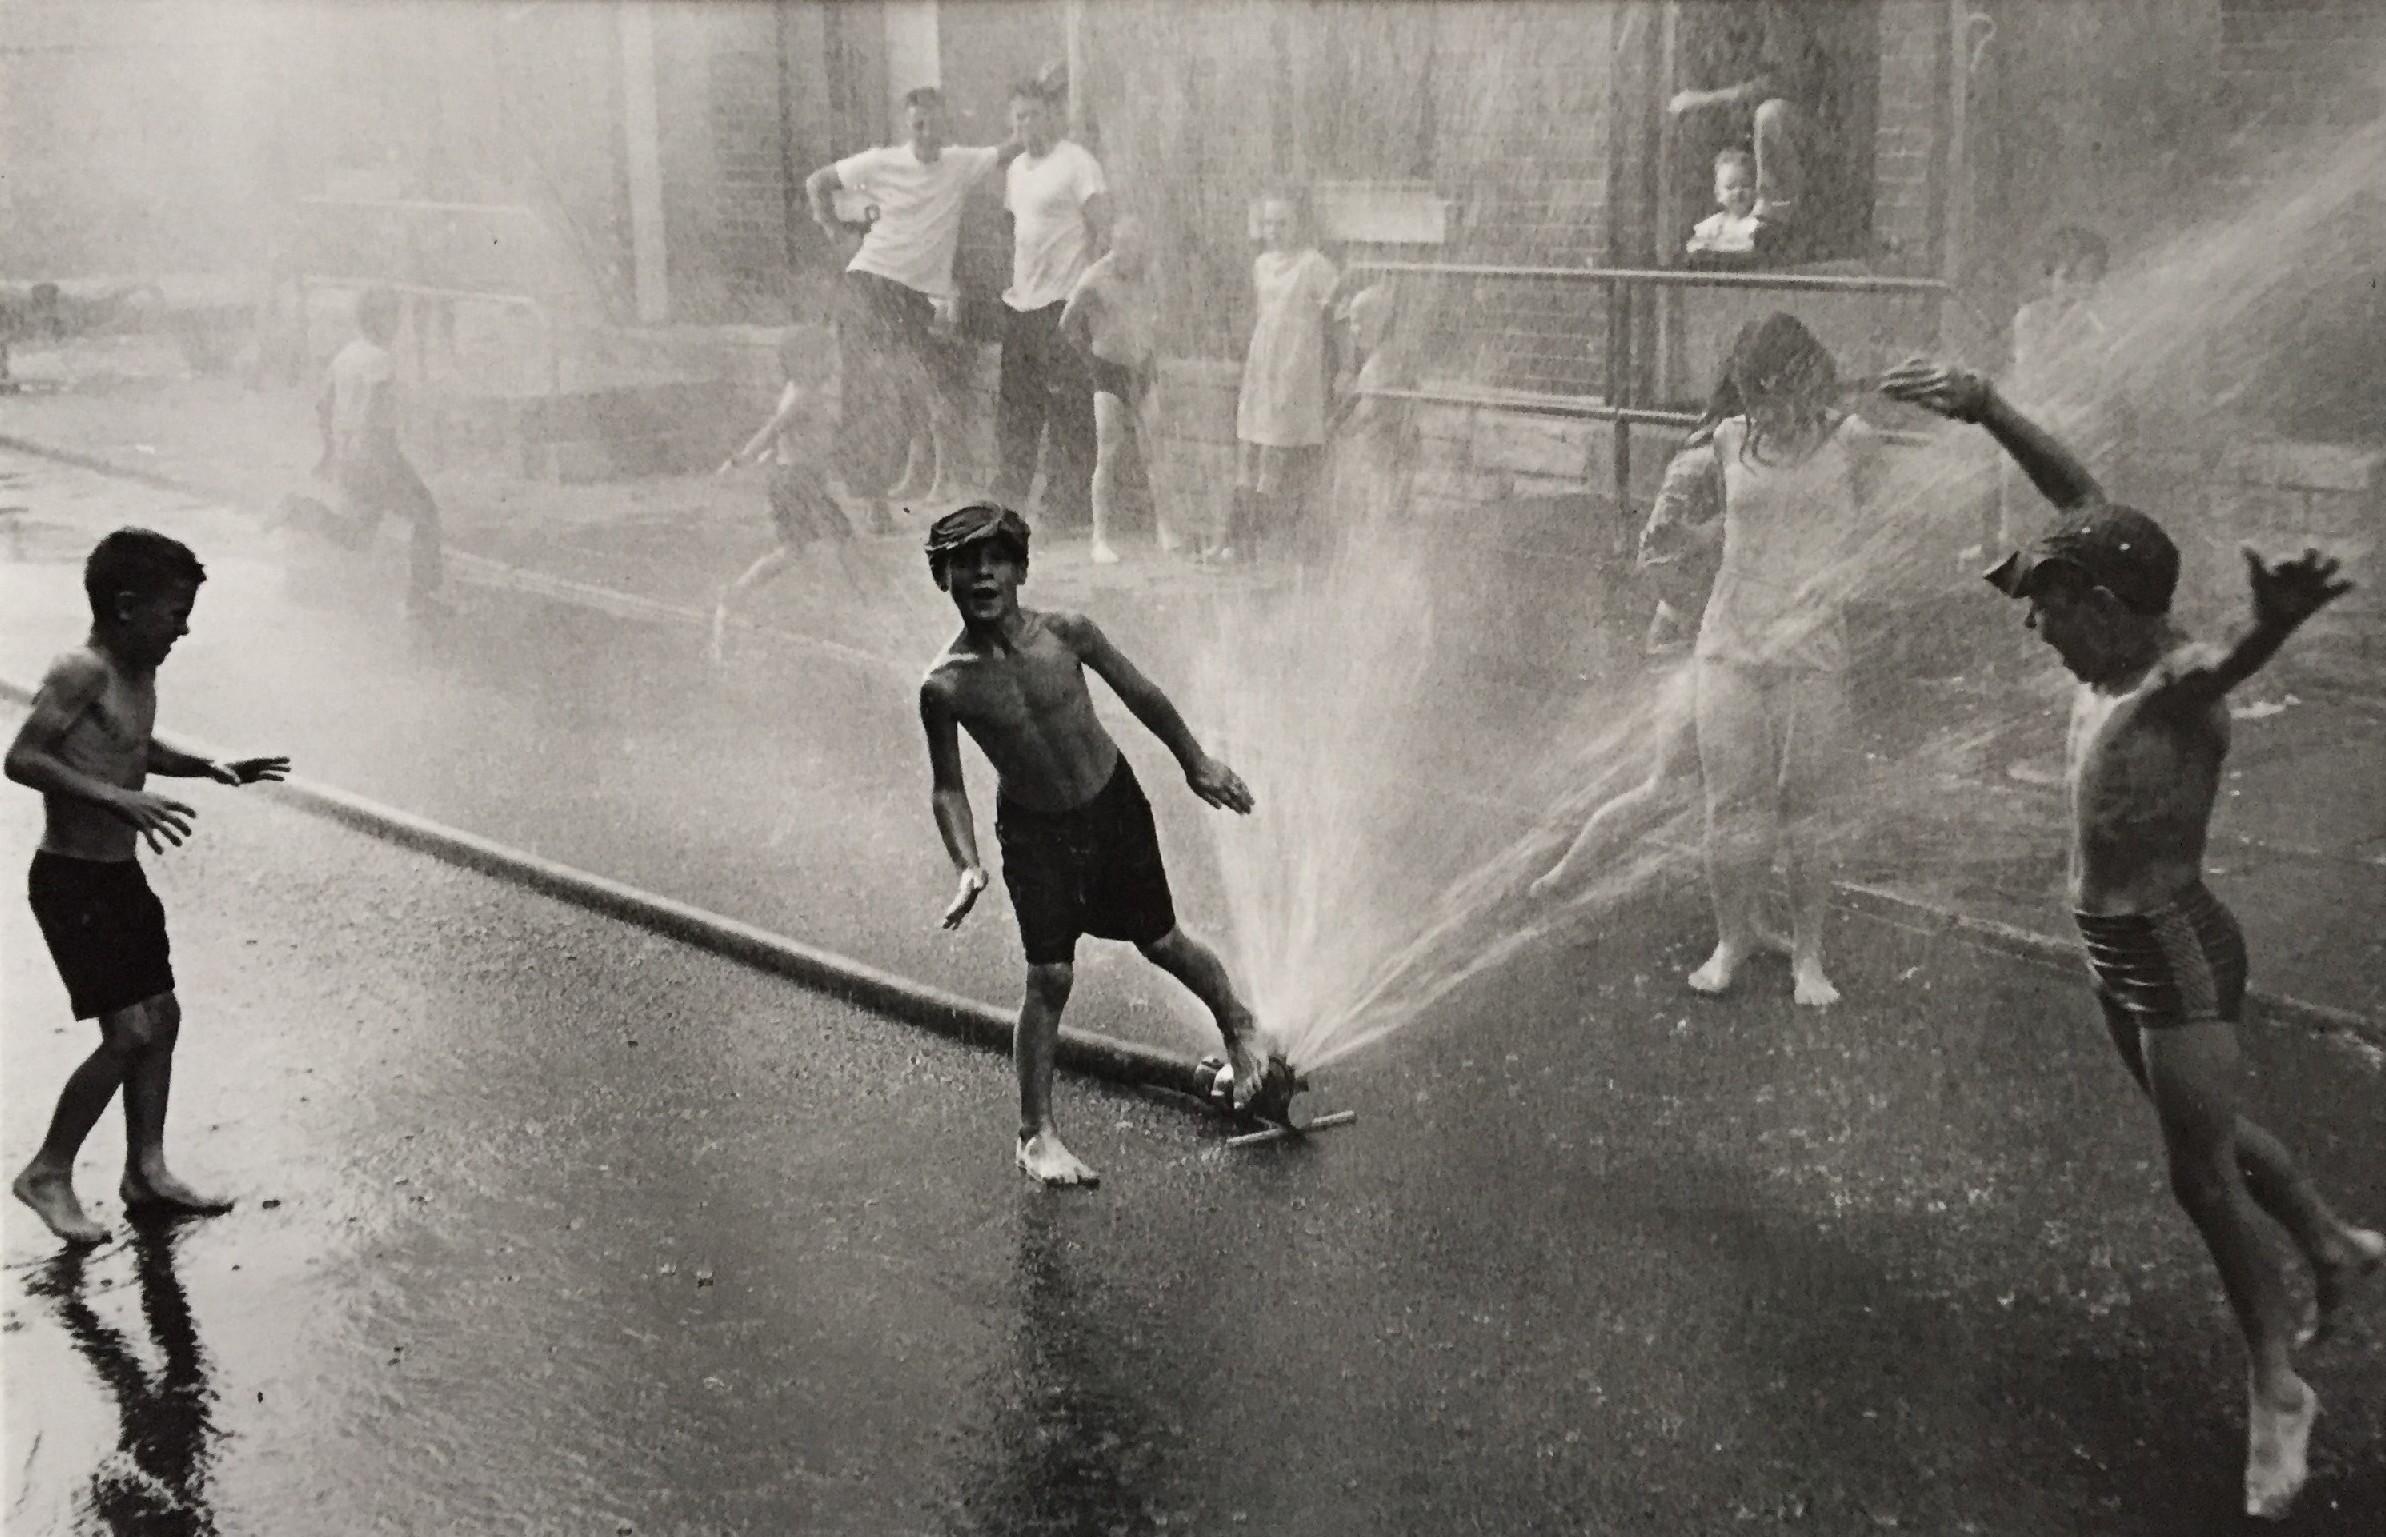 Wilkins Avenue, Corktown, Toronto, 1968